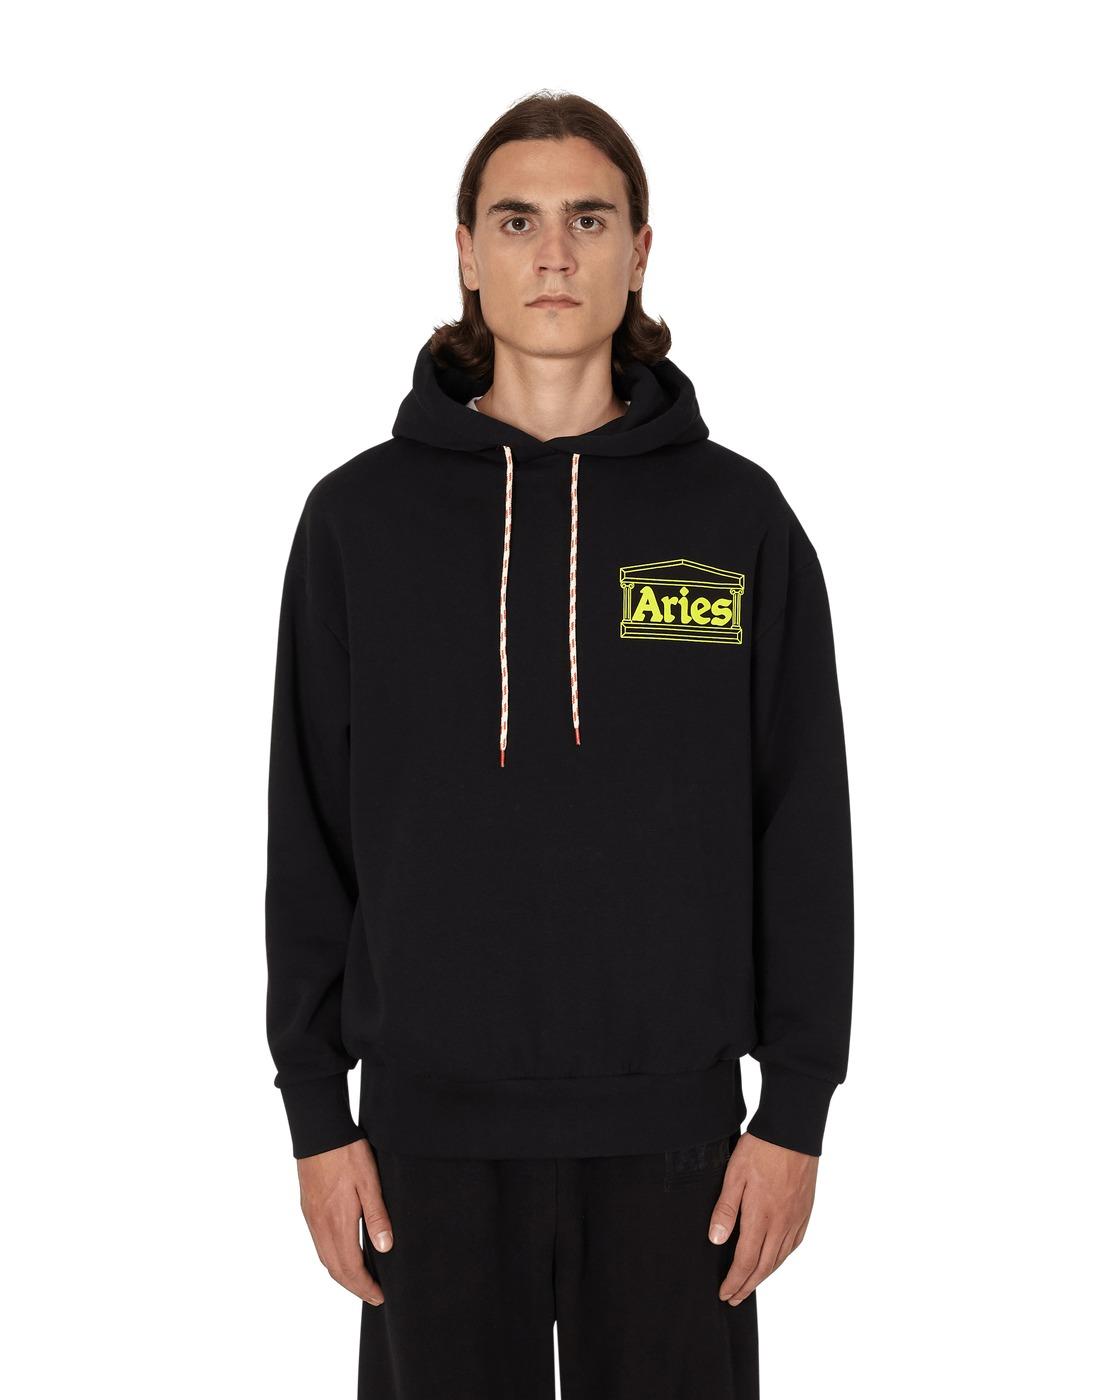 Photo: Aries Hands Off Hooded Sweatshirt Black